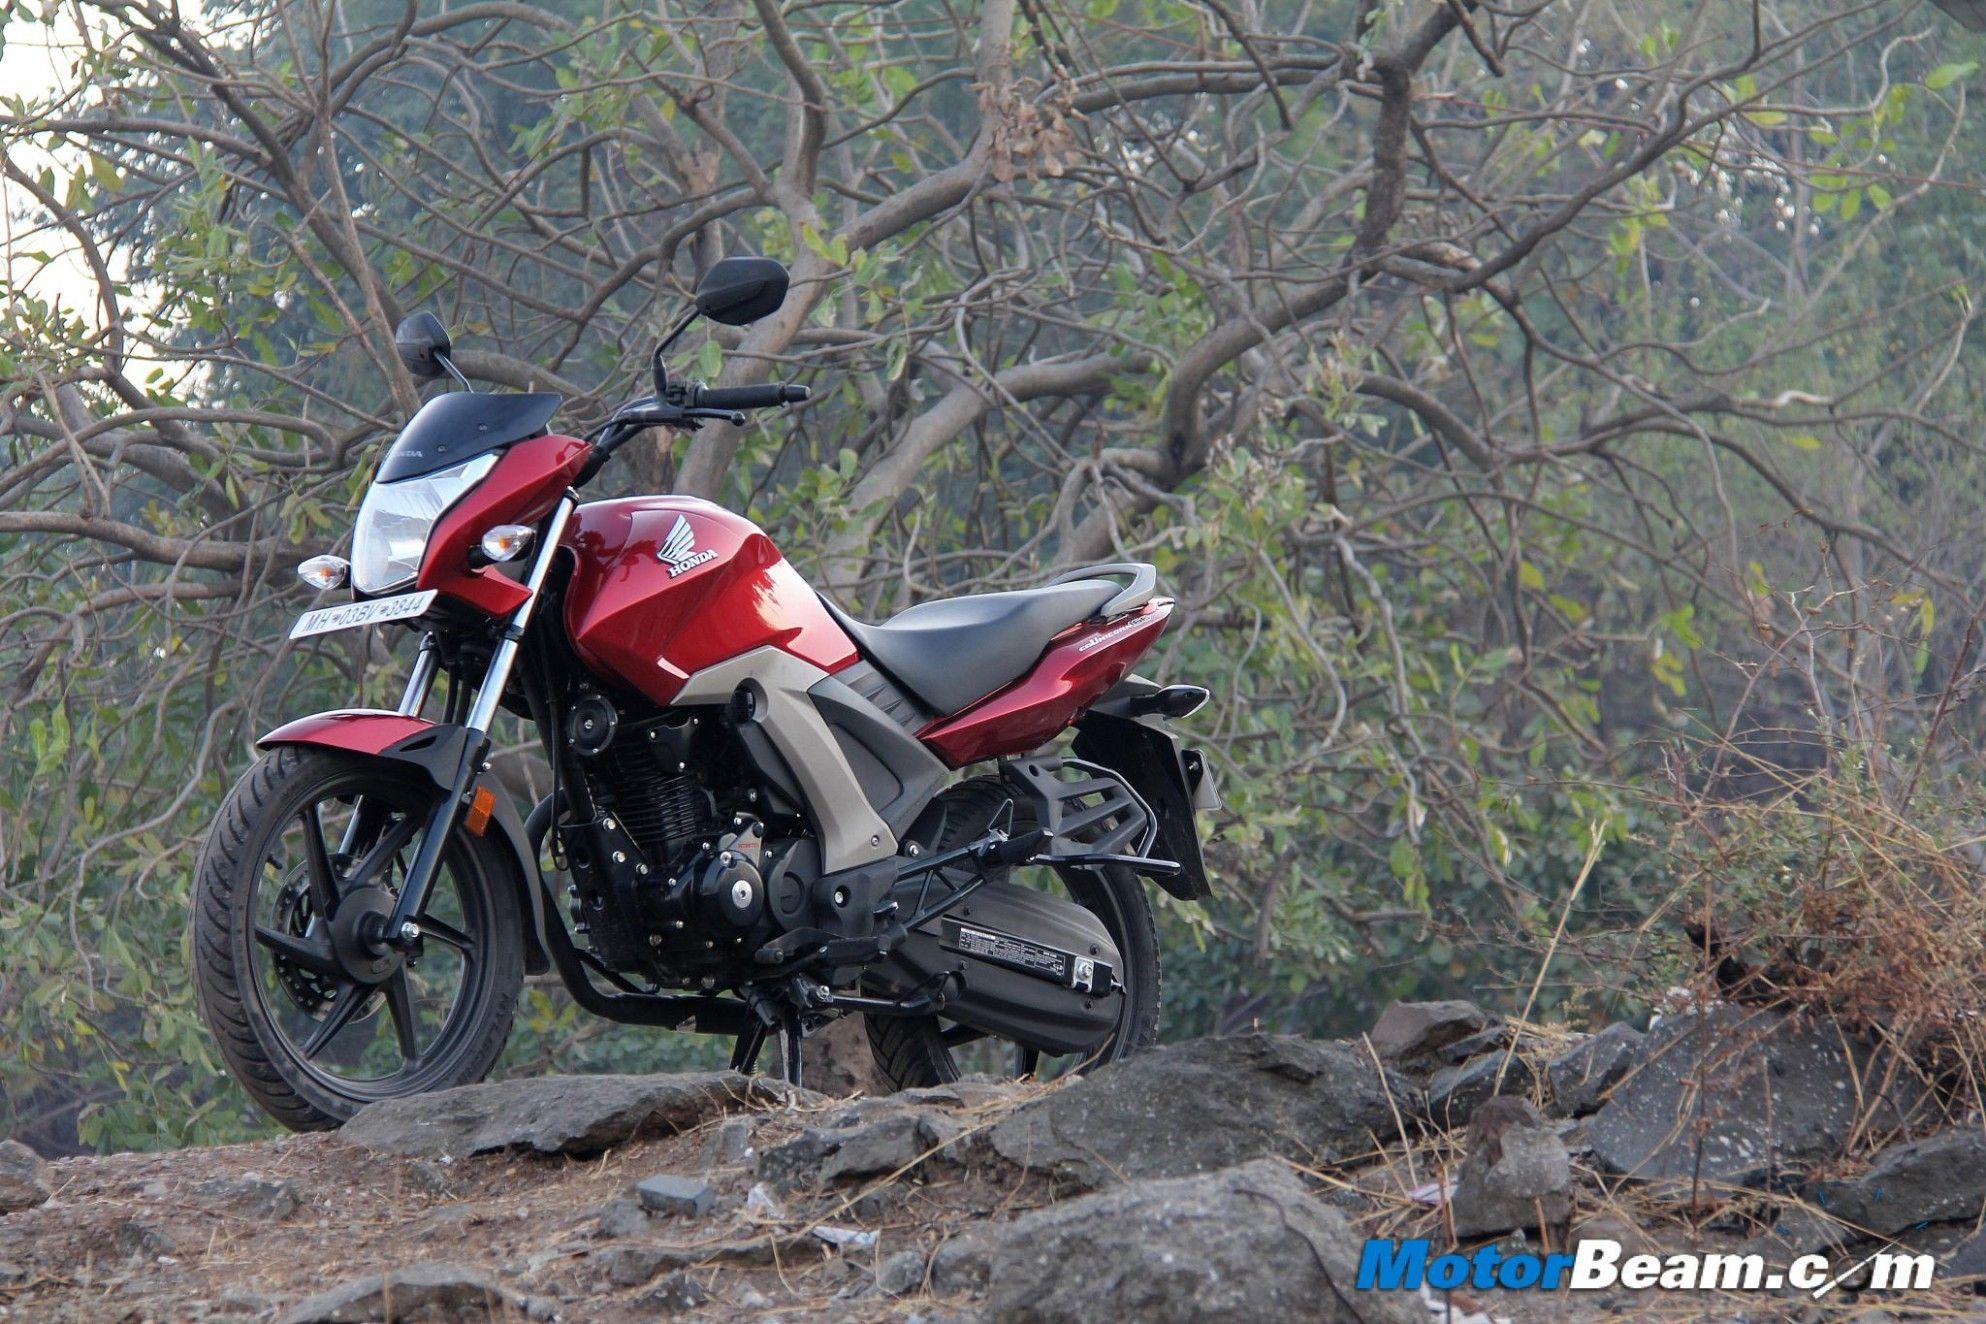 Honda Shine Sp 2020 Review Honda Shine Sp 2020 Honda Motorcycle